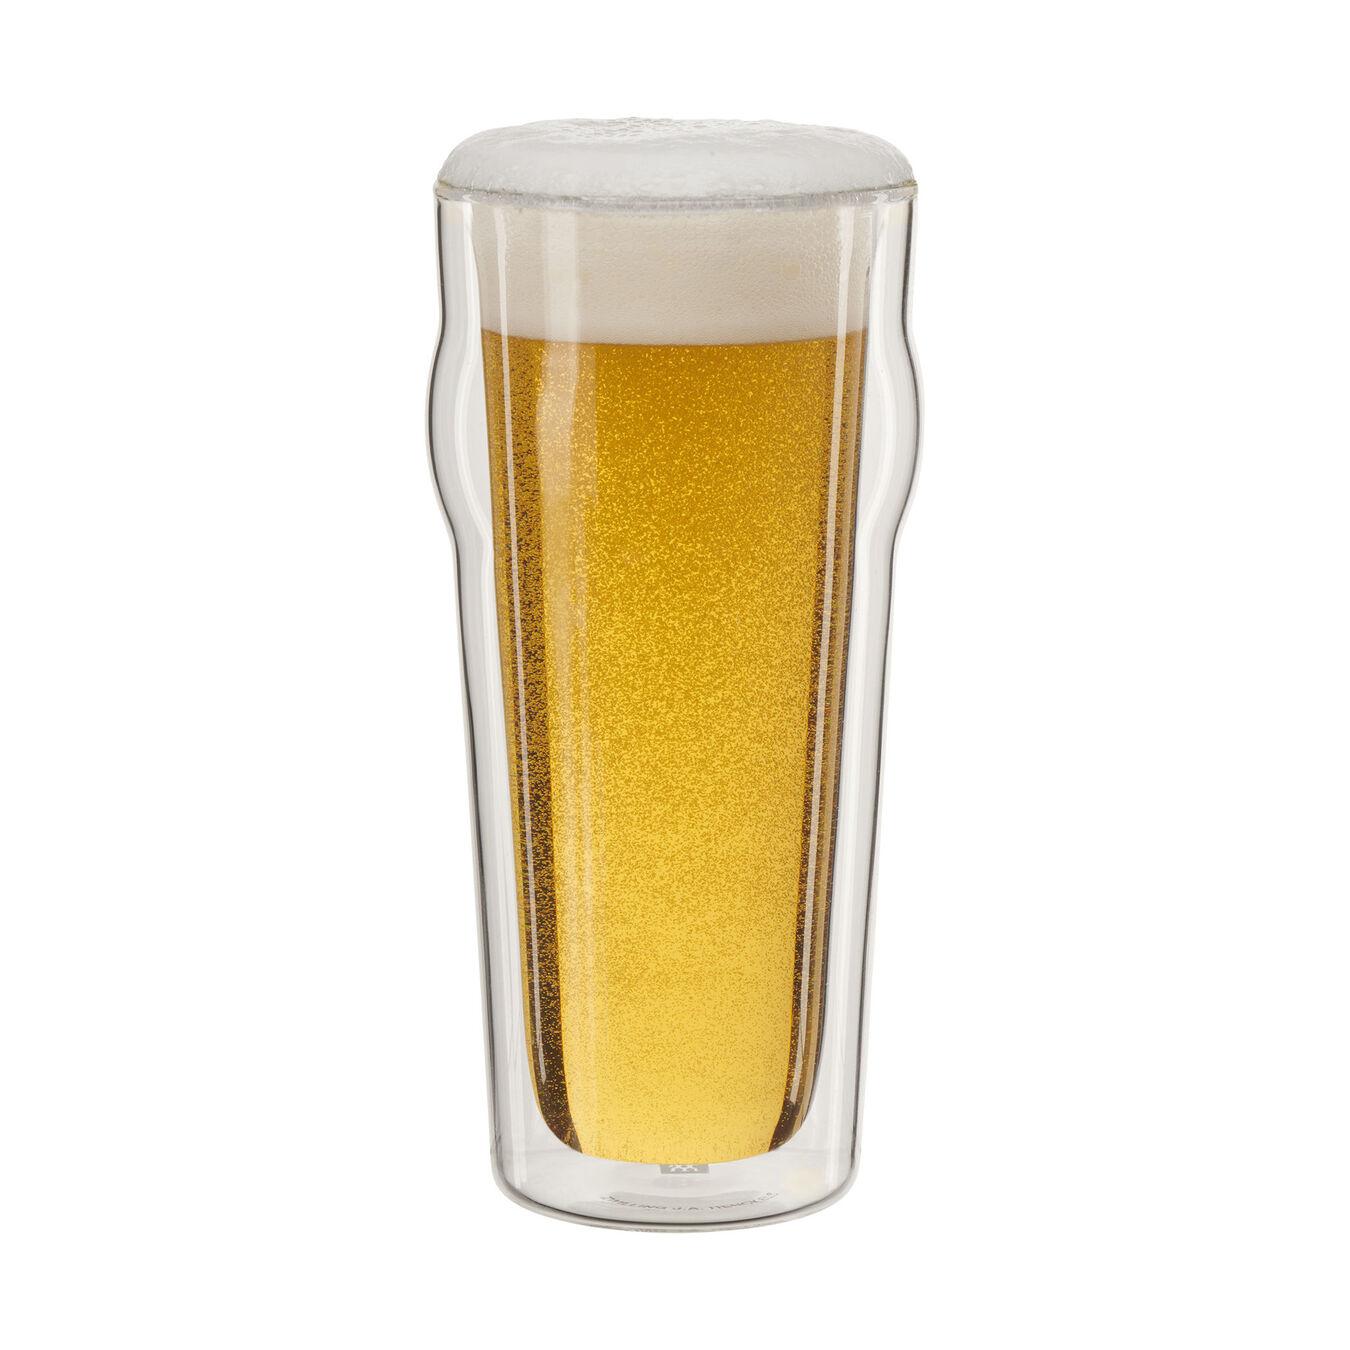 2 Piece Beer glass set,,large 1